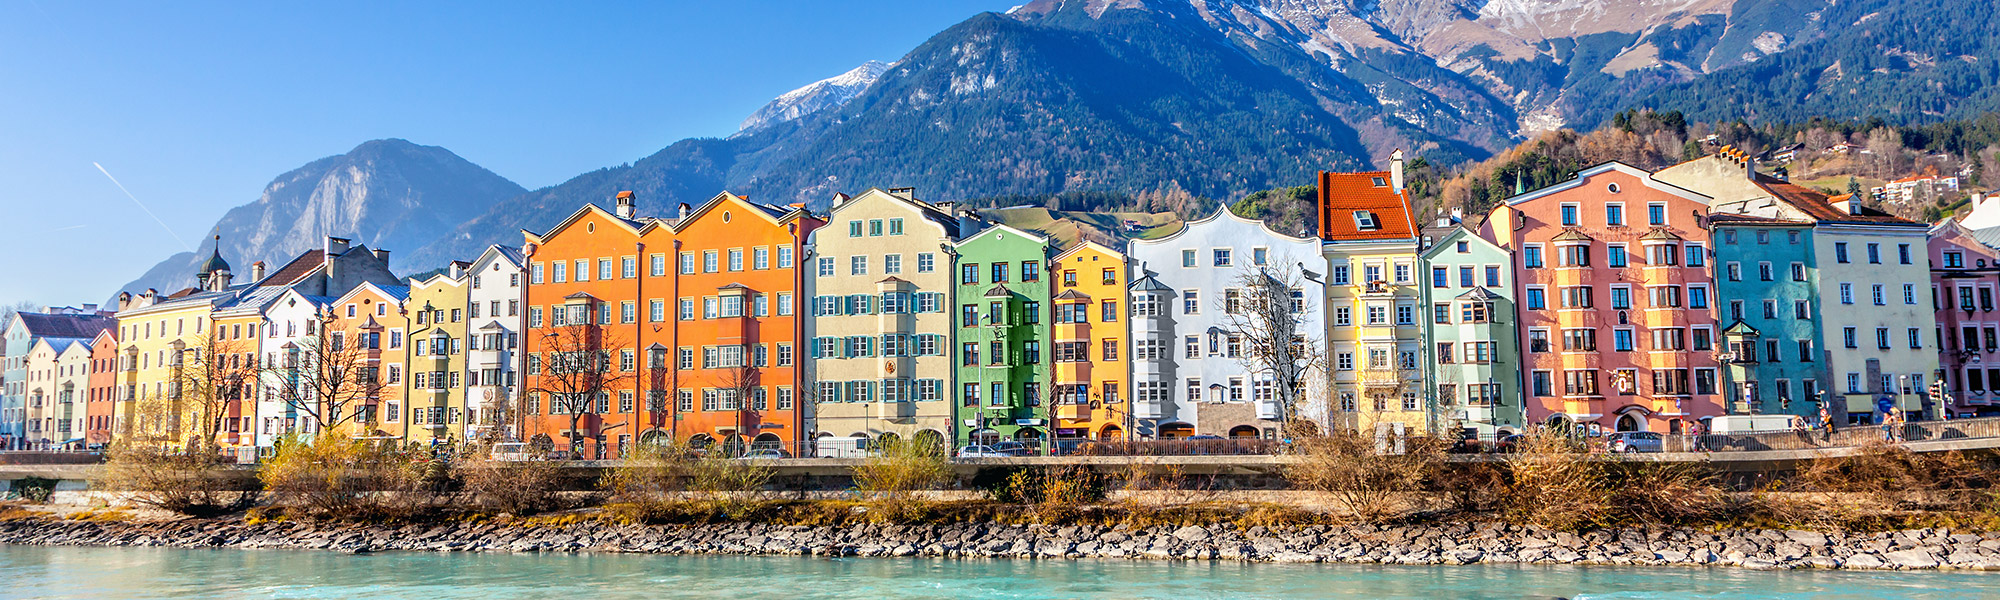 Reisebüro Innsbruck - Christophorus Reisen